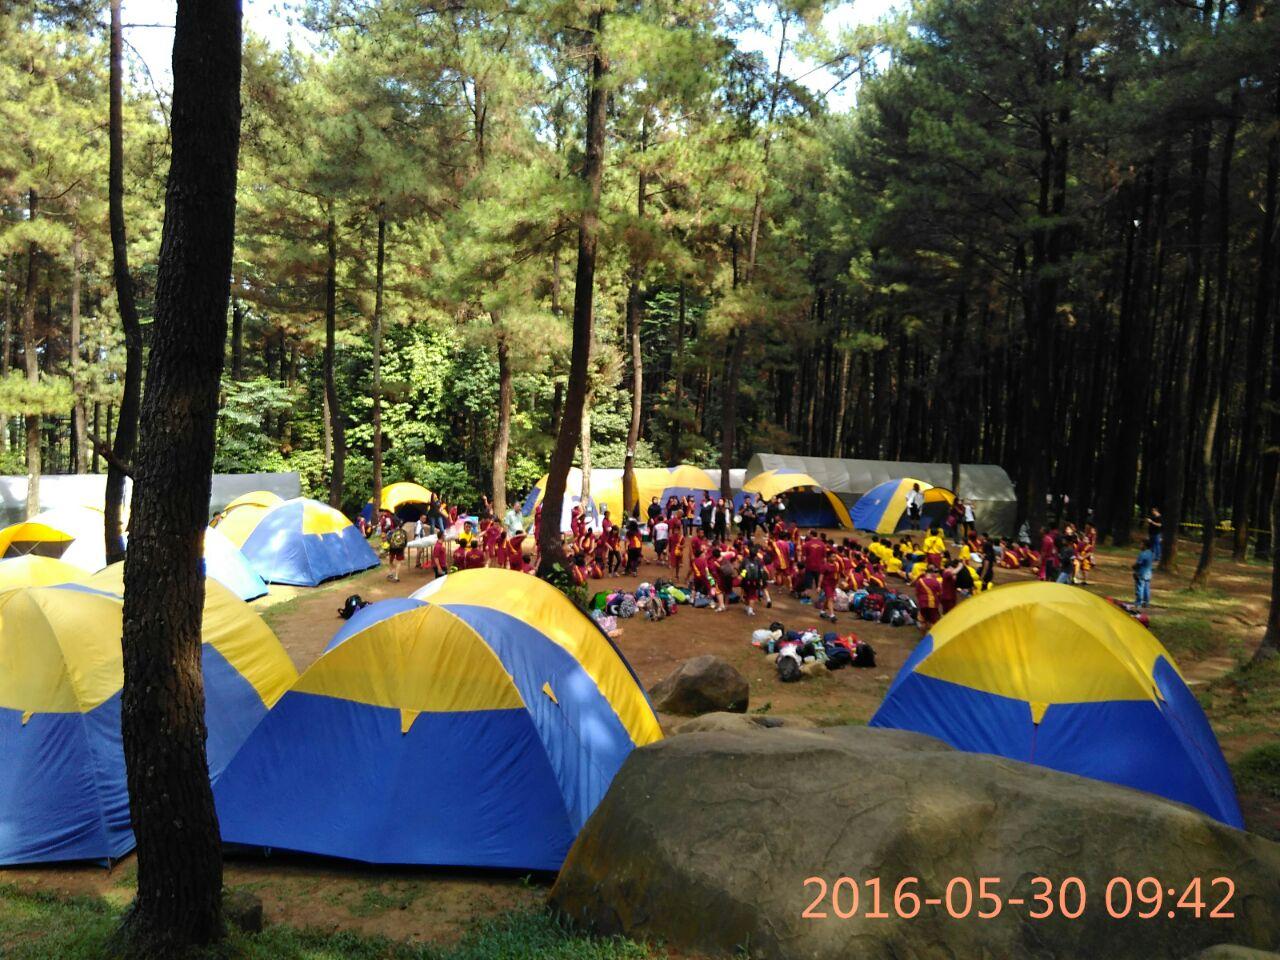 Gunung Pancar Sentul Bogor Wisata Hutan Pinus Air Panas Camping